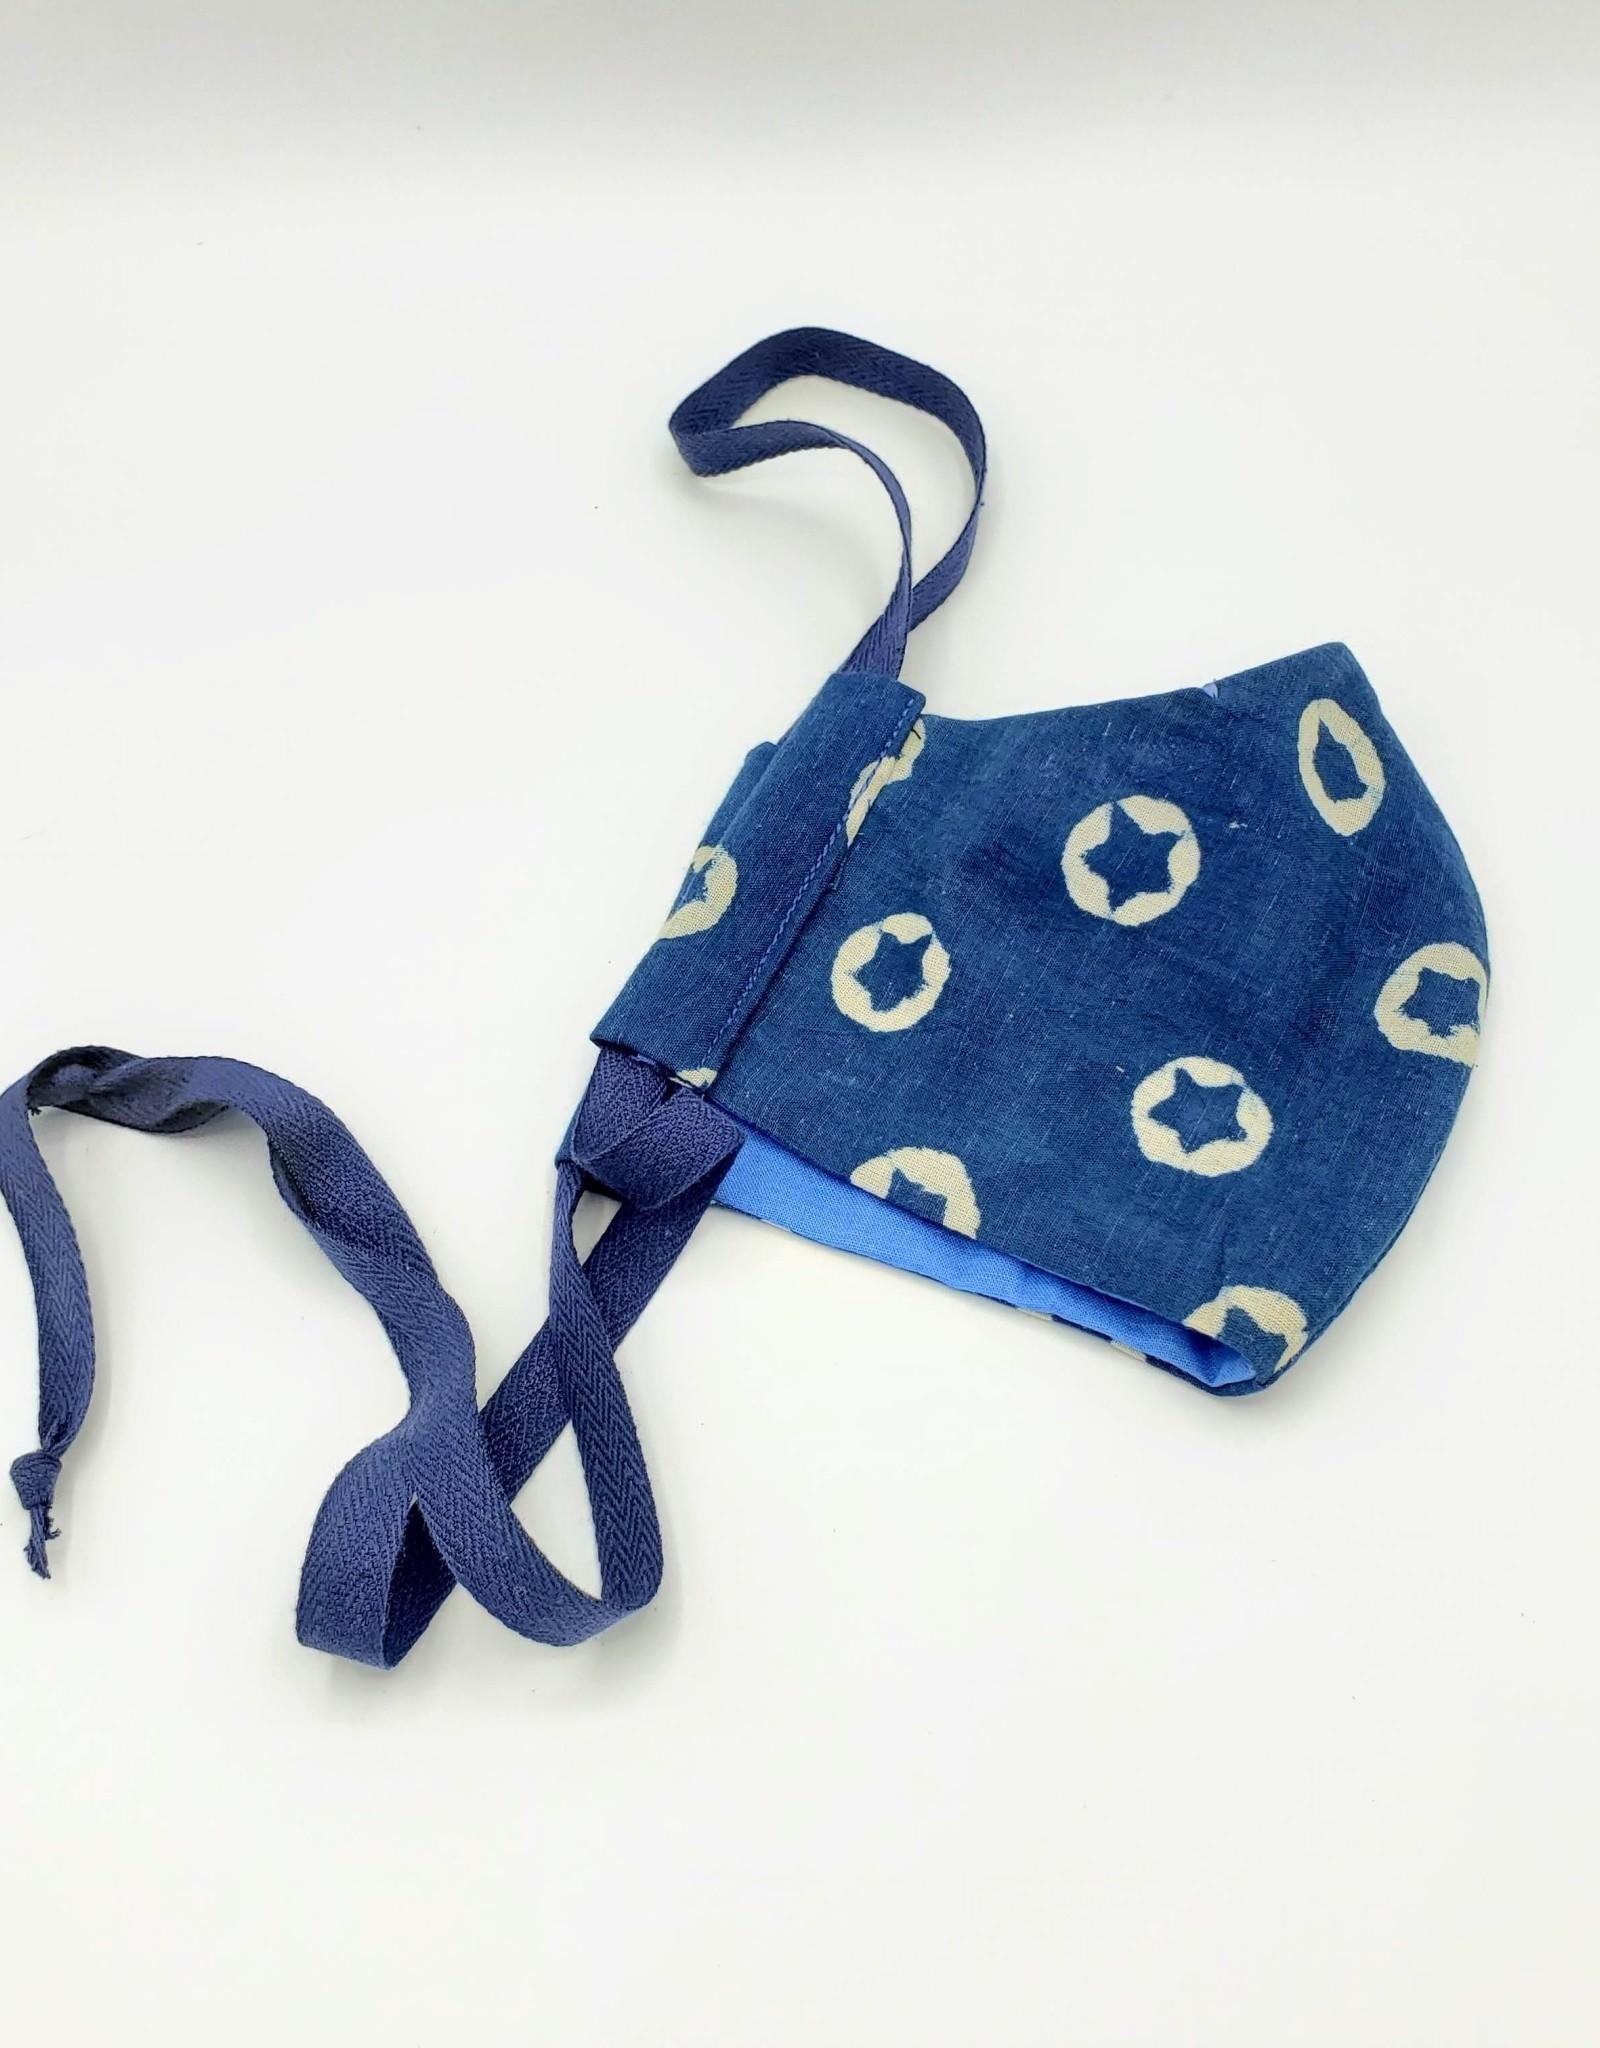 Redux Shibori Indigo Mask - Handmade Fabric Face Mask